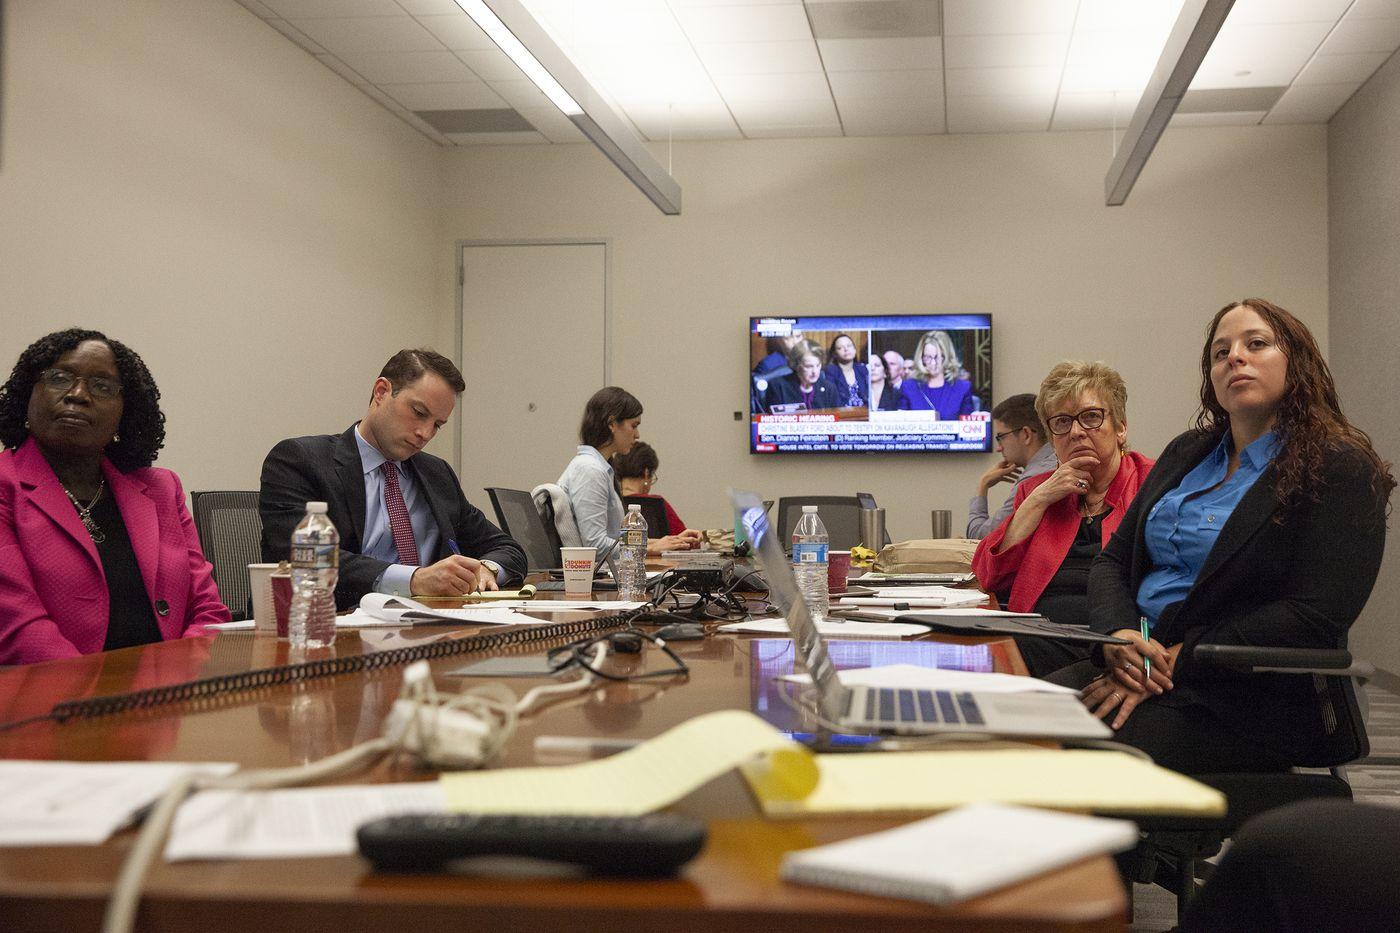 Philadelphia-area experts react to Kavanaugh's defiant defense